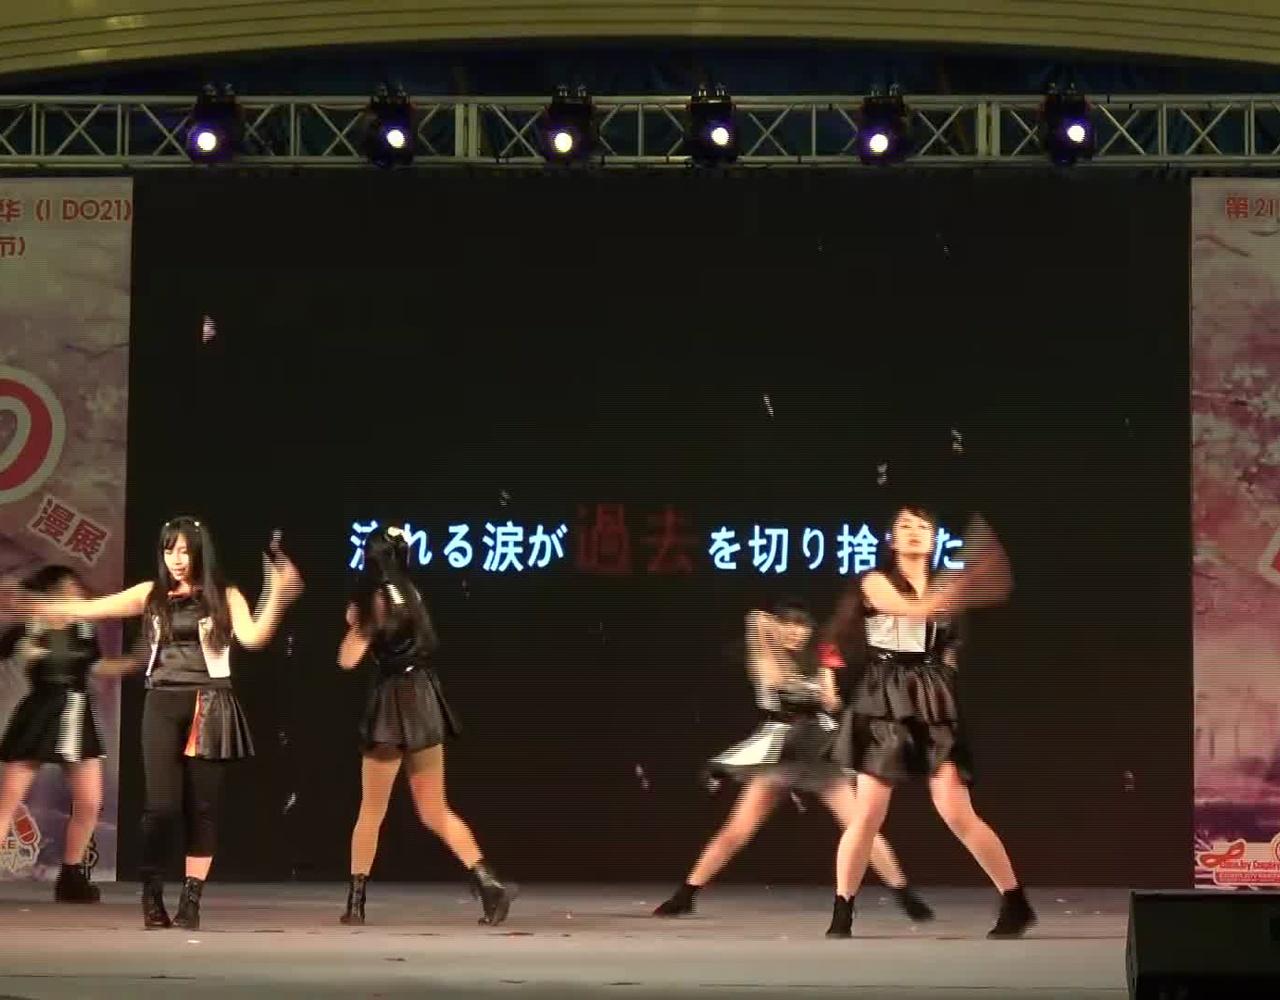 【Xena舞团】2017ChinaJoy超级联赛北京分赛区